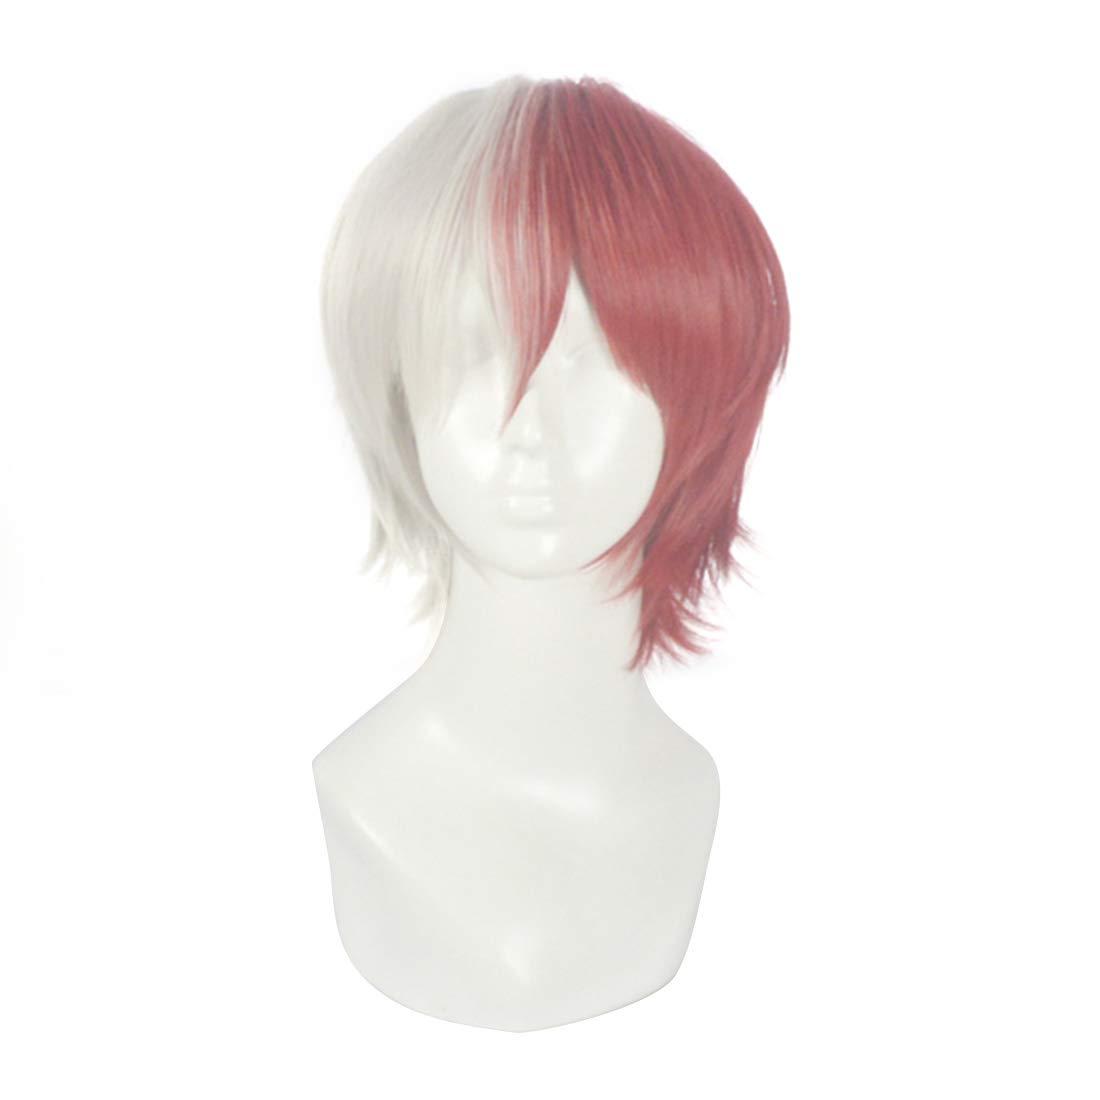 Anglayif Anime Cosplay Perruque Bicolore Micro-Volume Cheveux Courts pour Mon héros Academy (Color : Half Silver Gray Half Red)